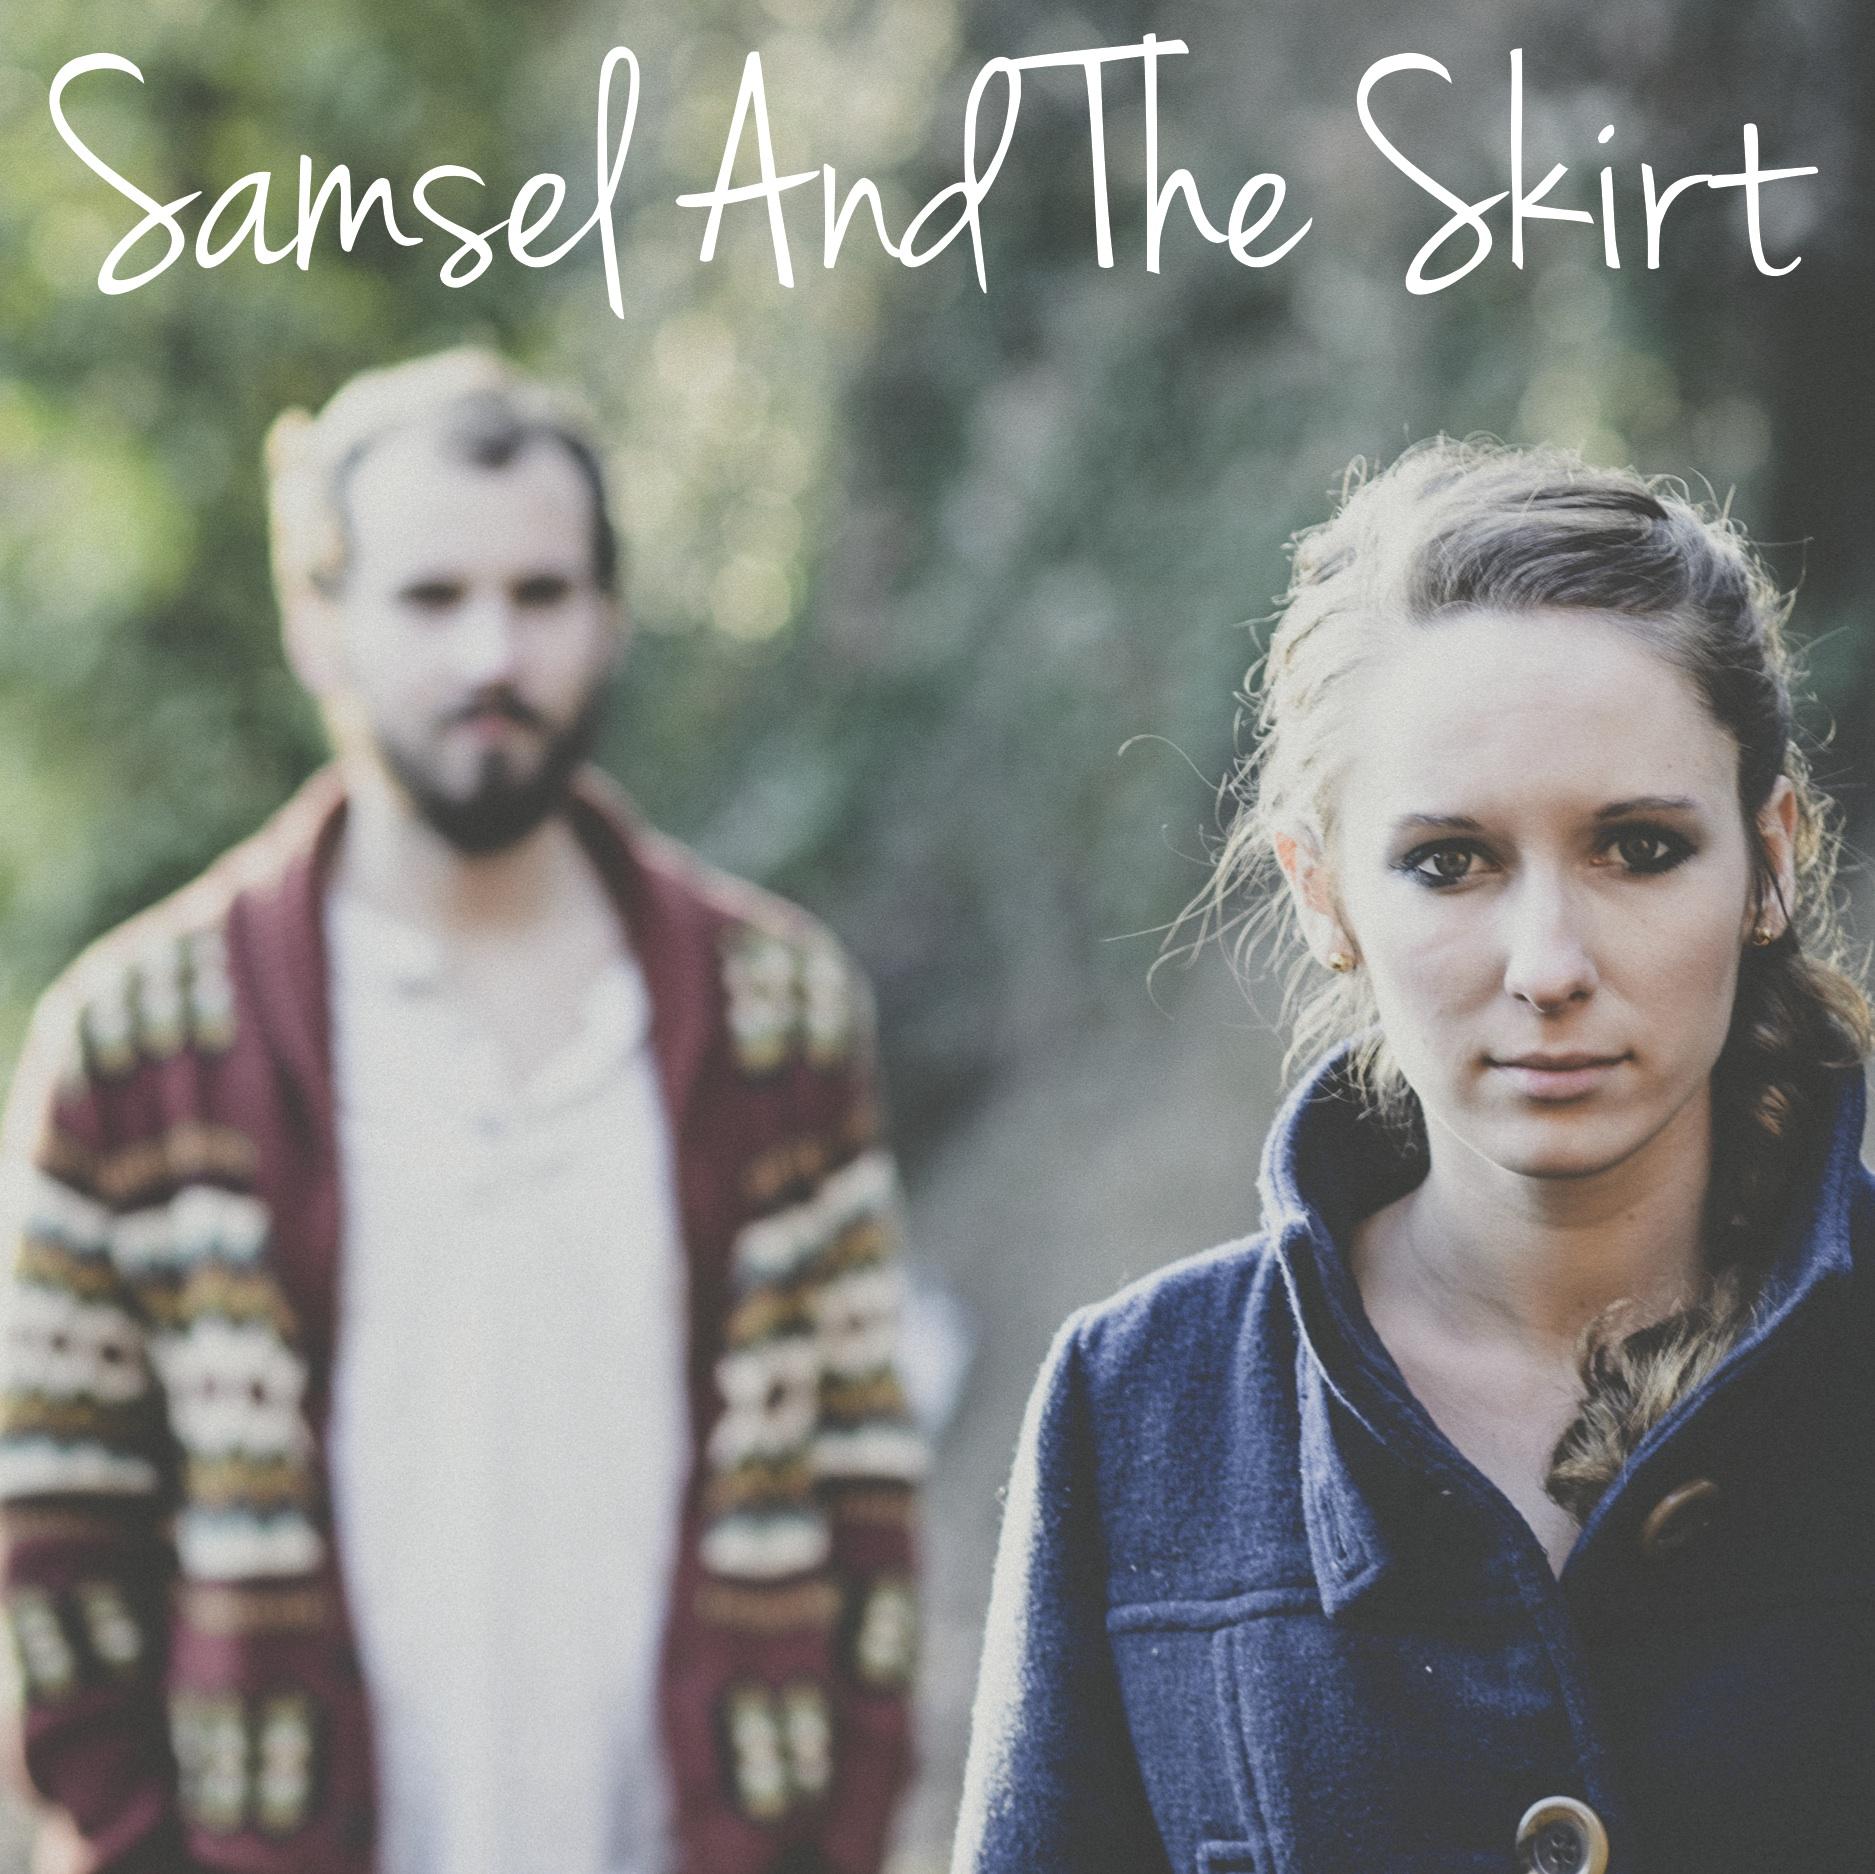 Samsel and the skirt -